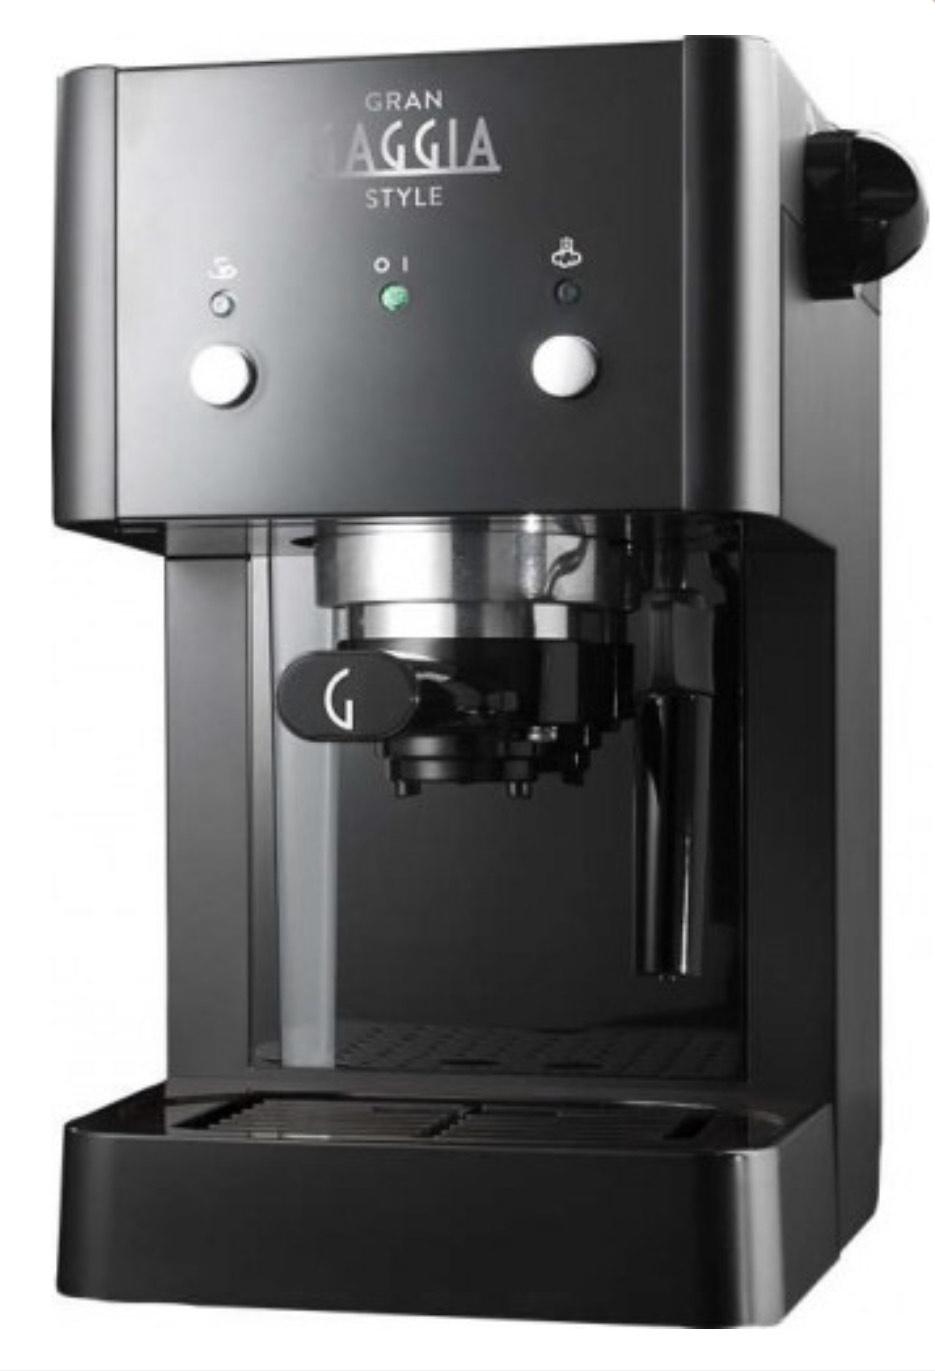 Gaggia Gran Gaggia Style Espresso £57.90 @ Amazon Italy